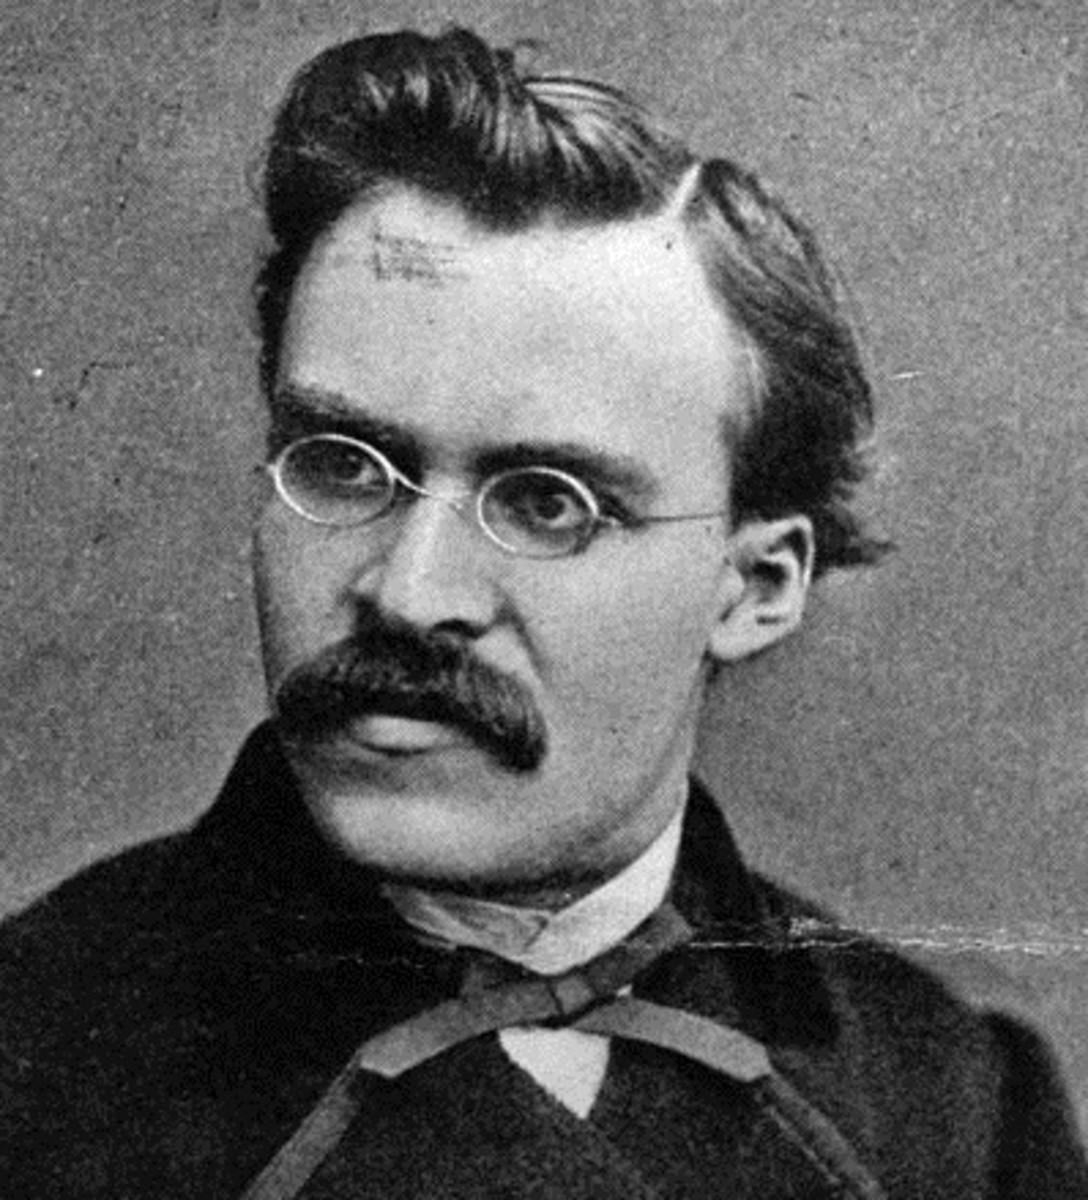 Nietzsche allegedly influenced Hitler.